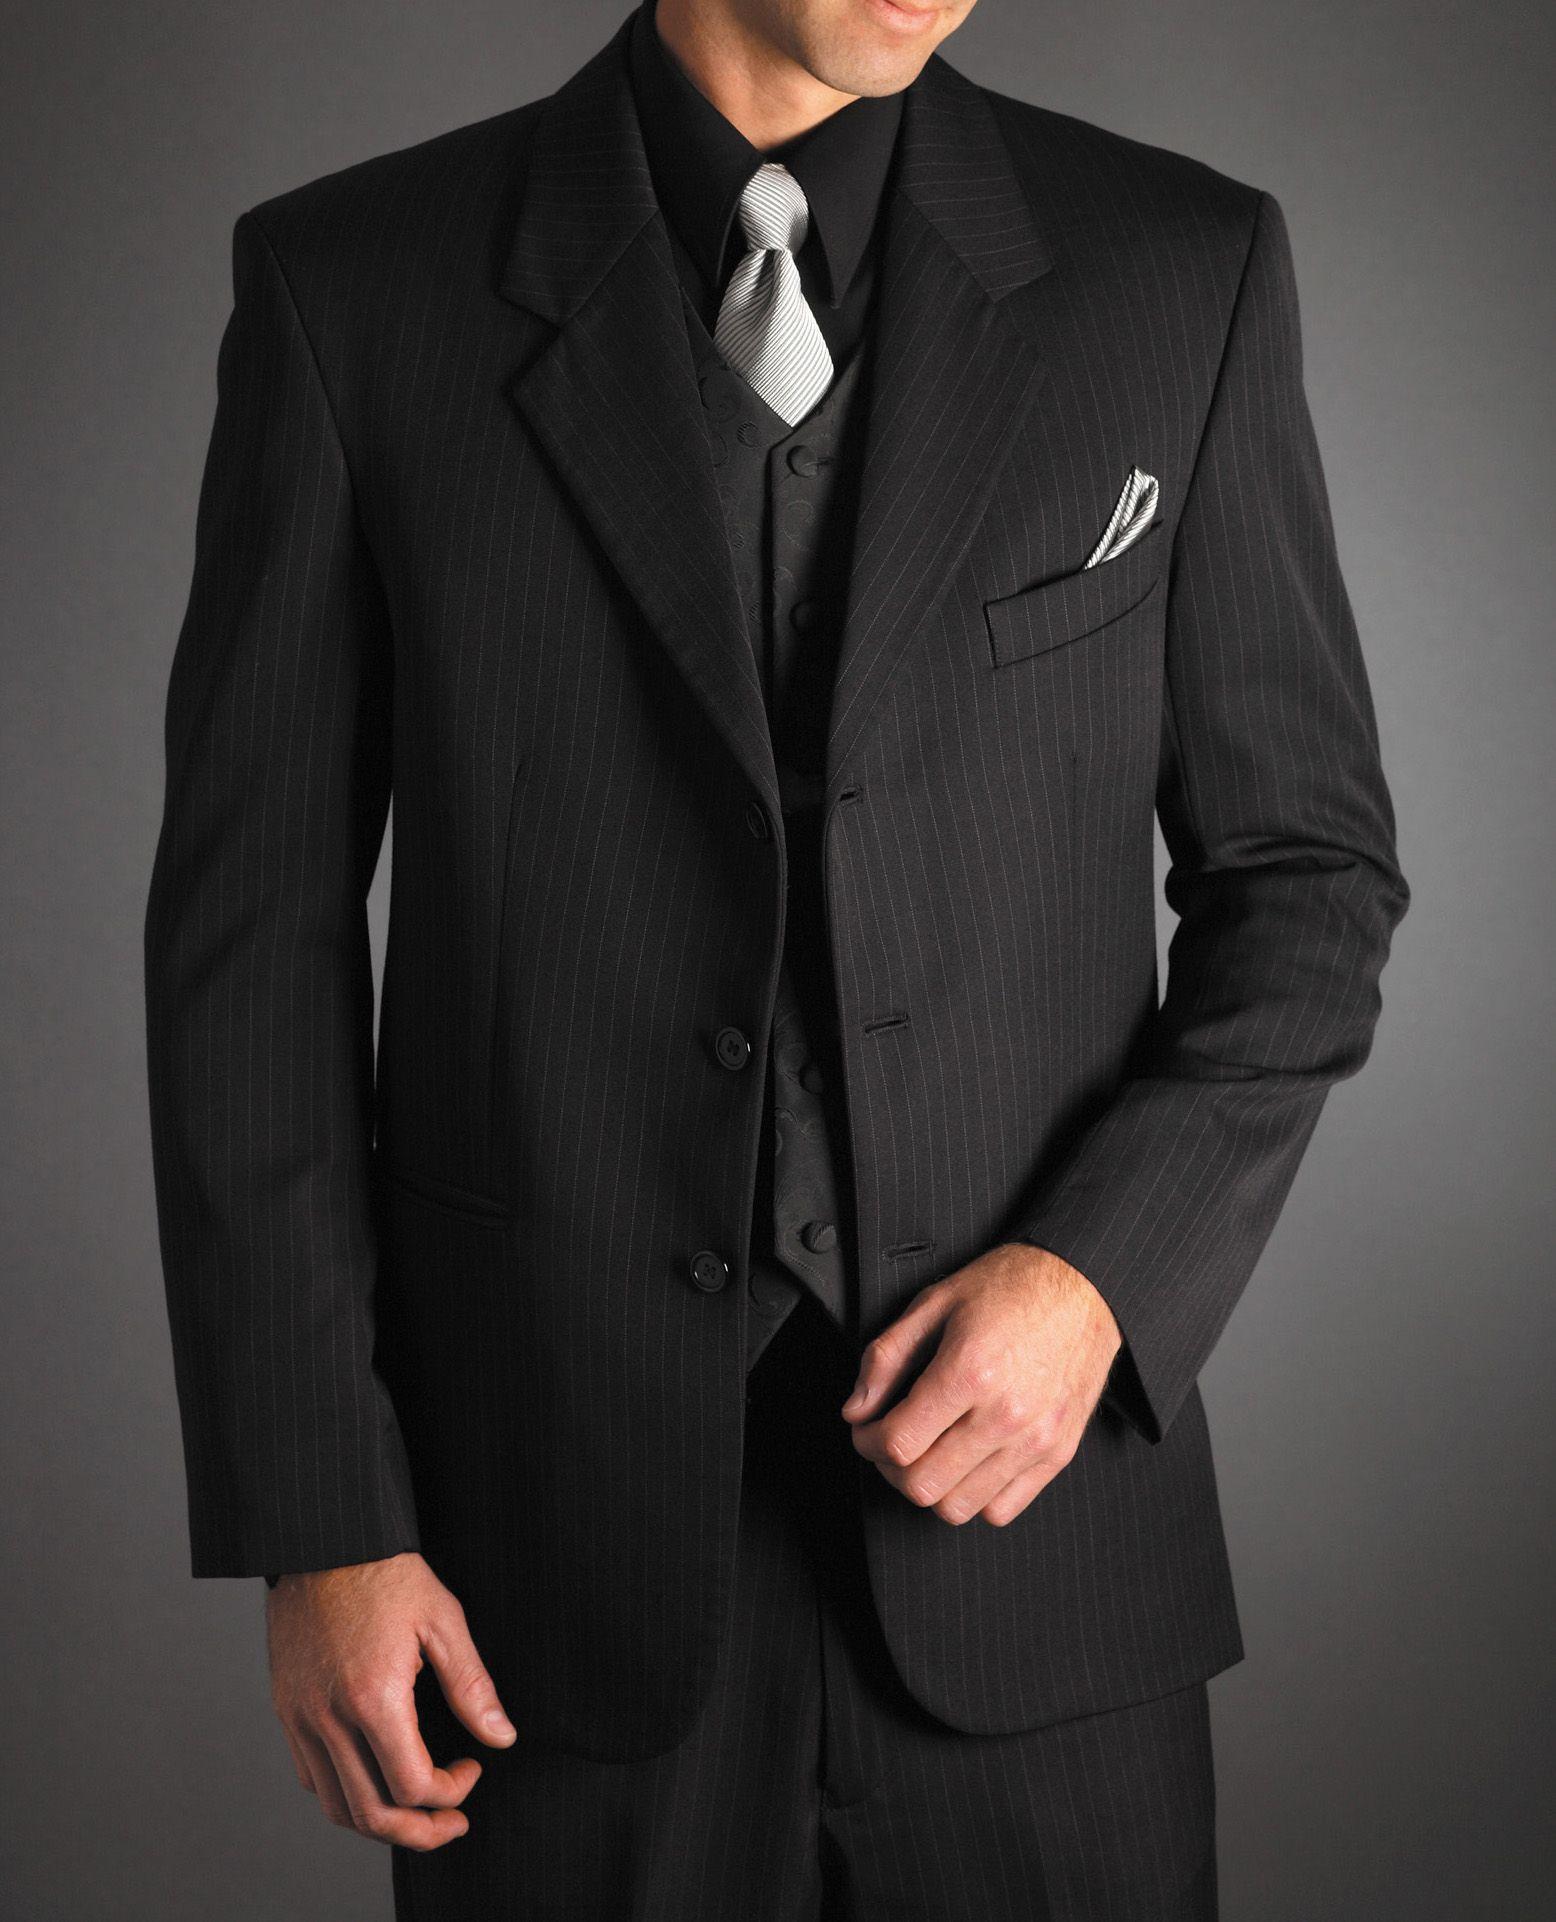 Black Tuxedo With Black Shirt And White Tie | www.pixshark ...